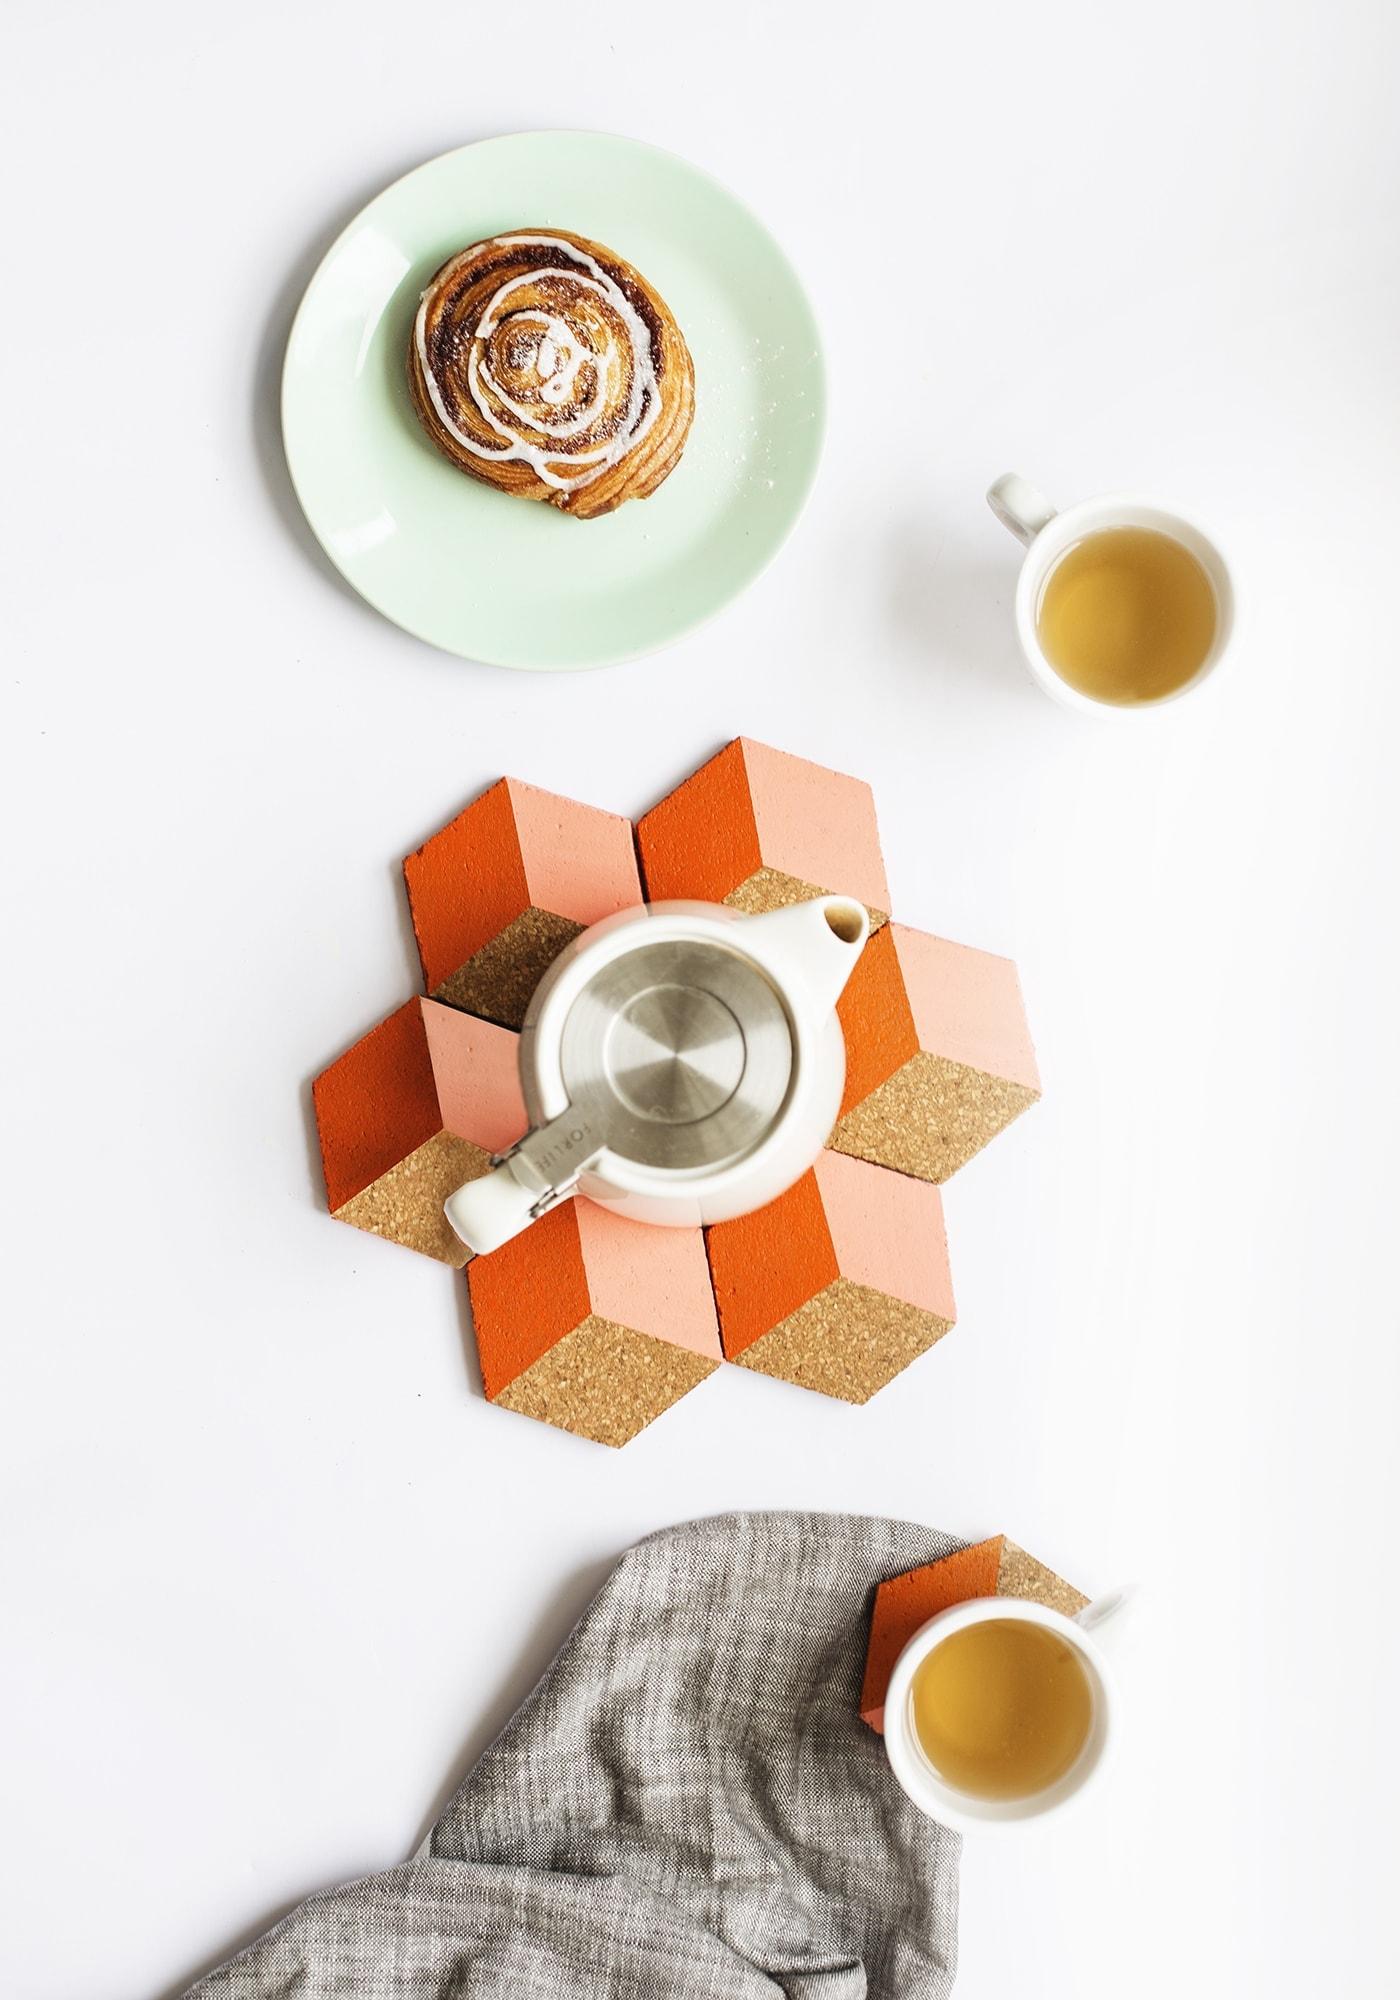 DIY geometric coaster idea | perfect for hosting